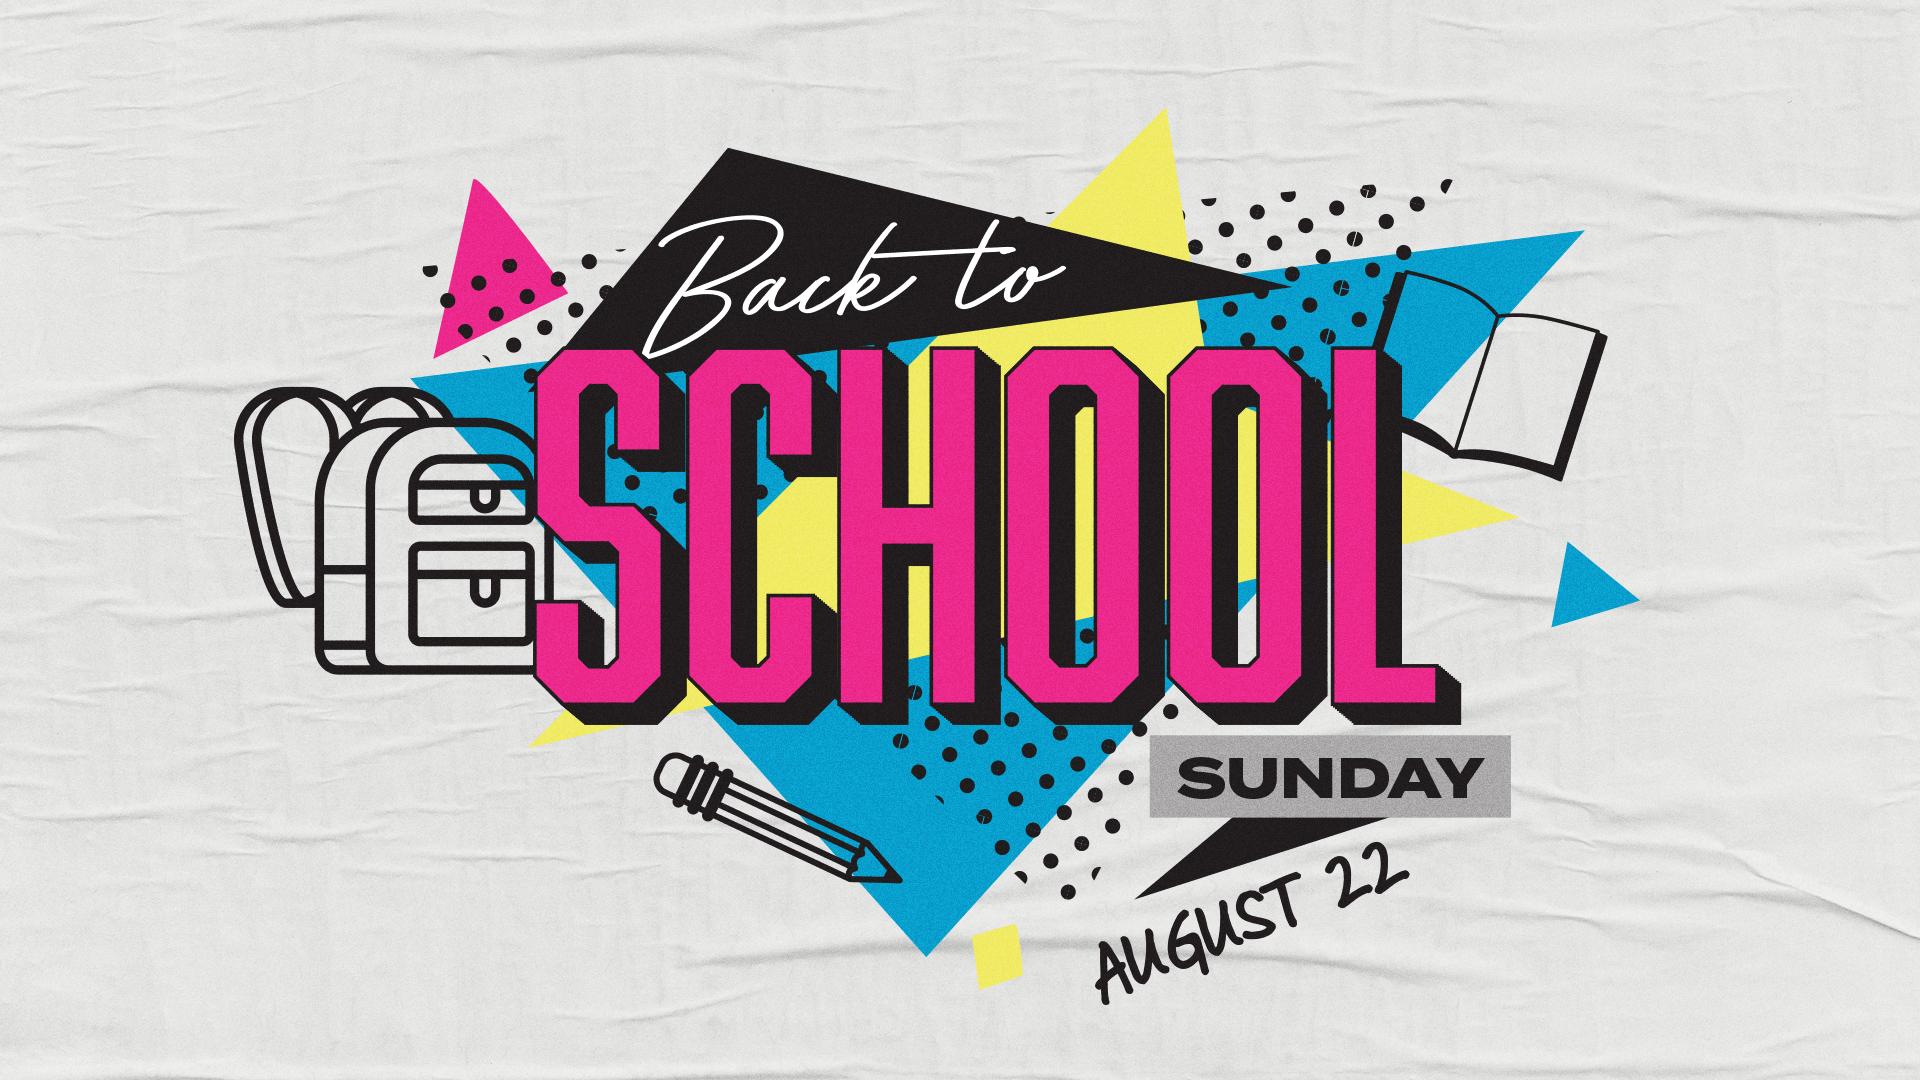 Back to School Sunday